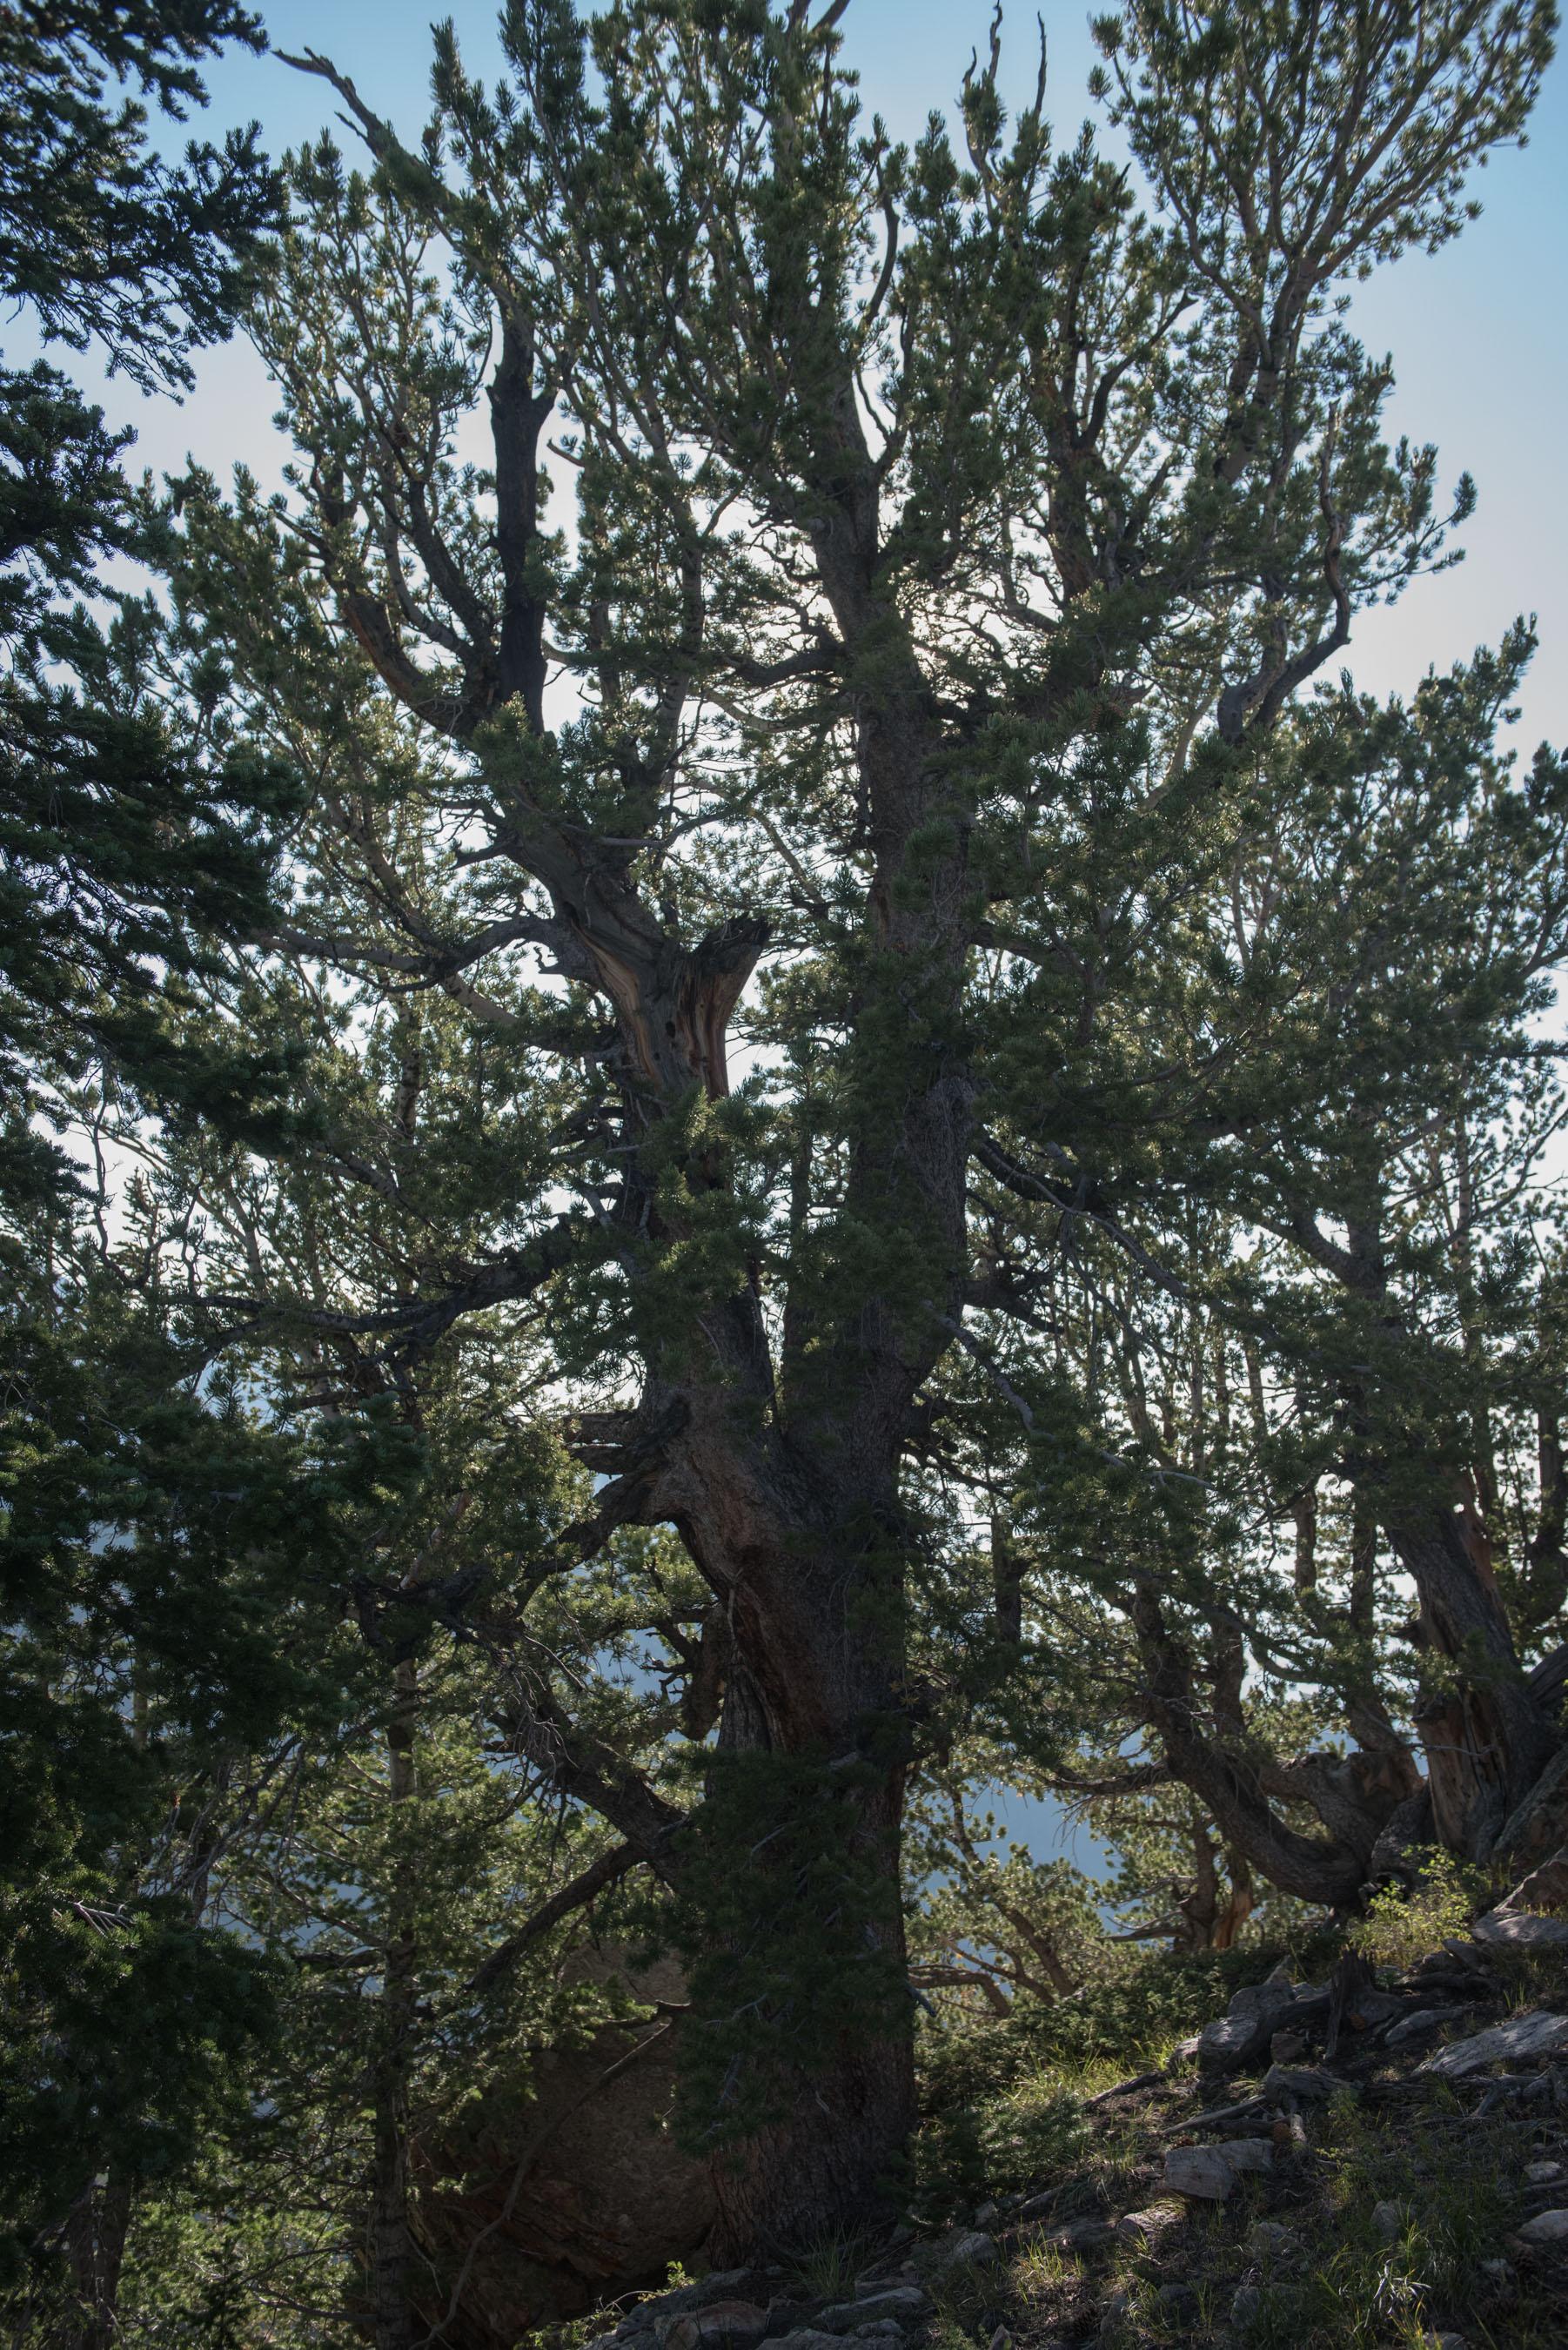 Bristlecone pine tree in the Wasatch Range. Utah.